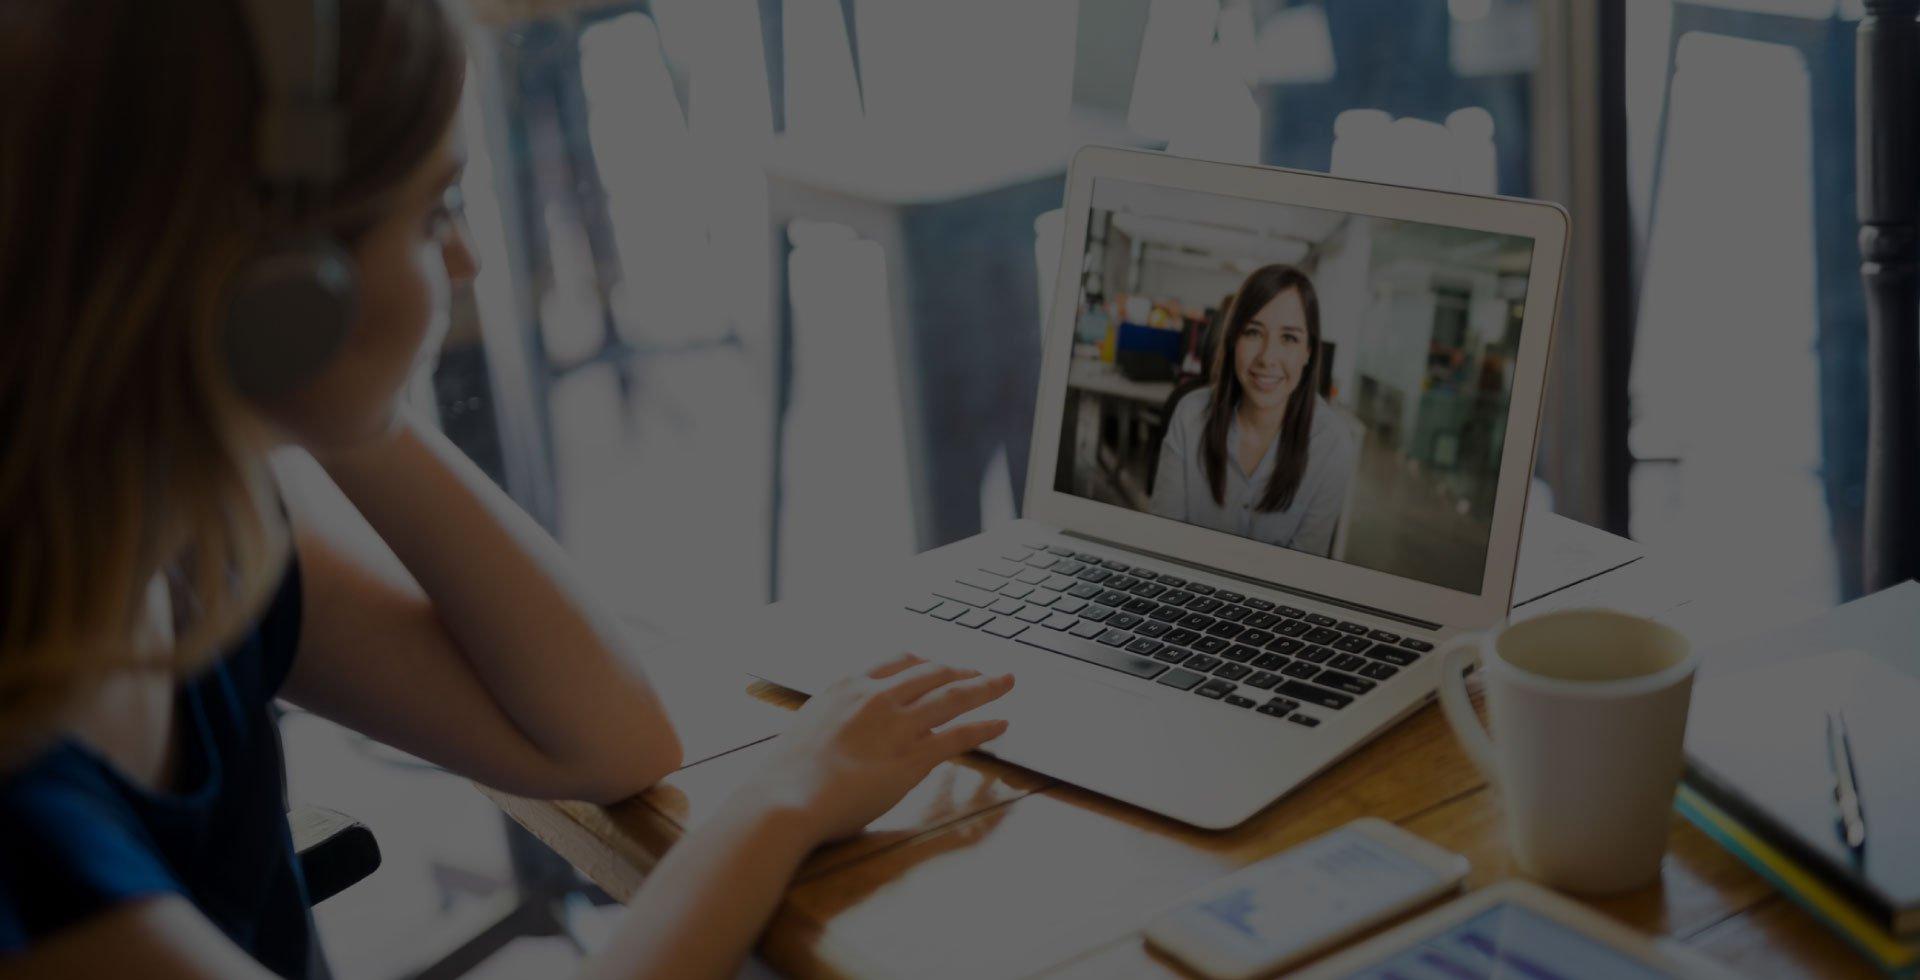 Woman on Laptop speaking to someone